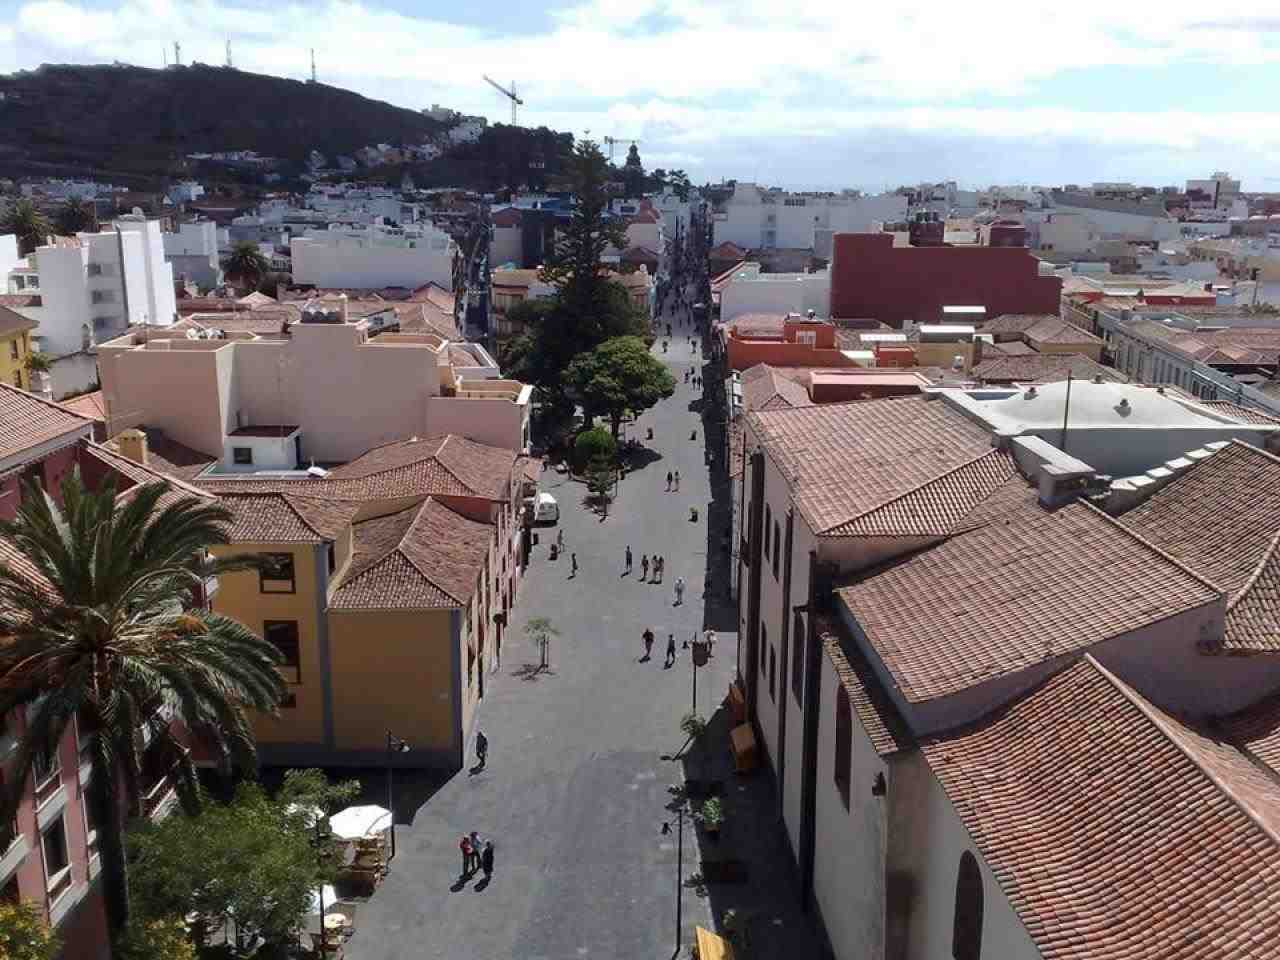 Pisos  alquiler San Cristóbal de La Laguna, Santa Cruz de Tenerife